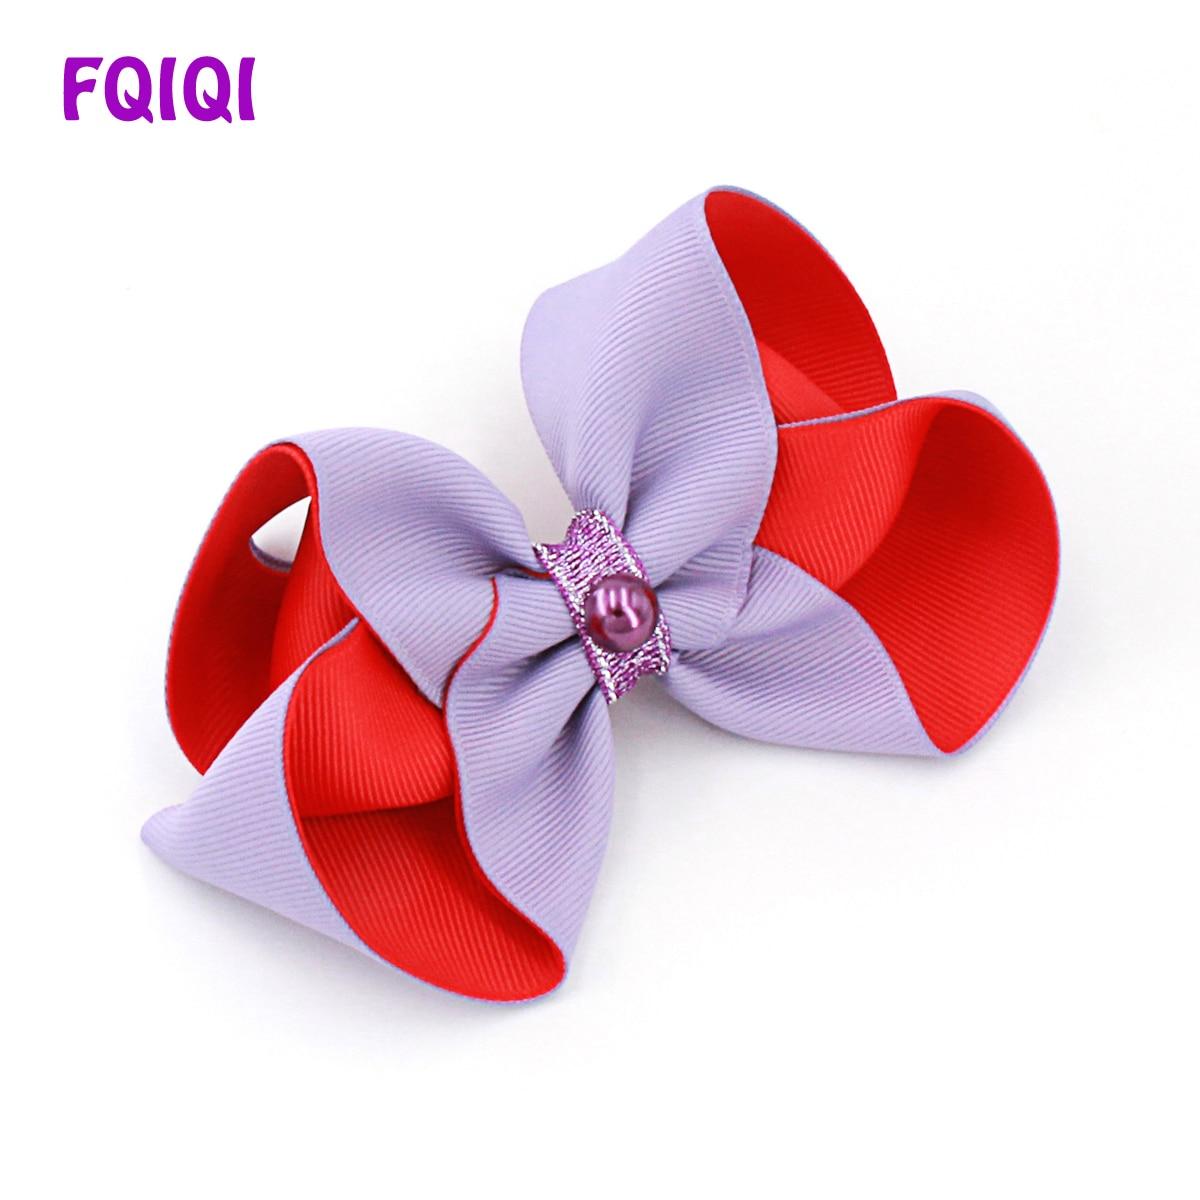 Girls' Accessories Handmade 4 Inch Hair Clip Bow Lilac